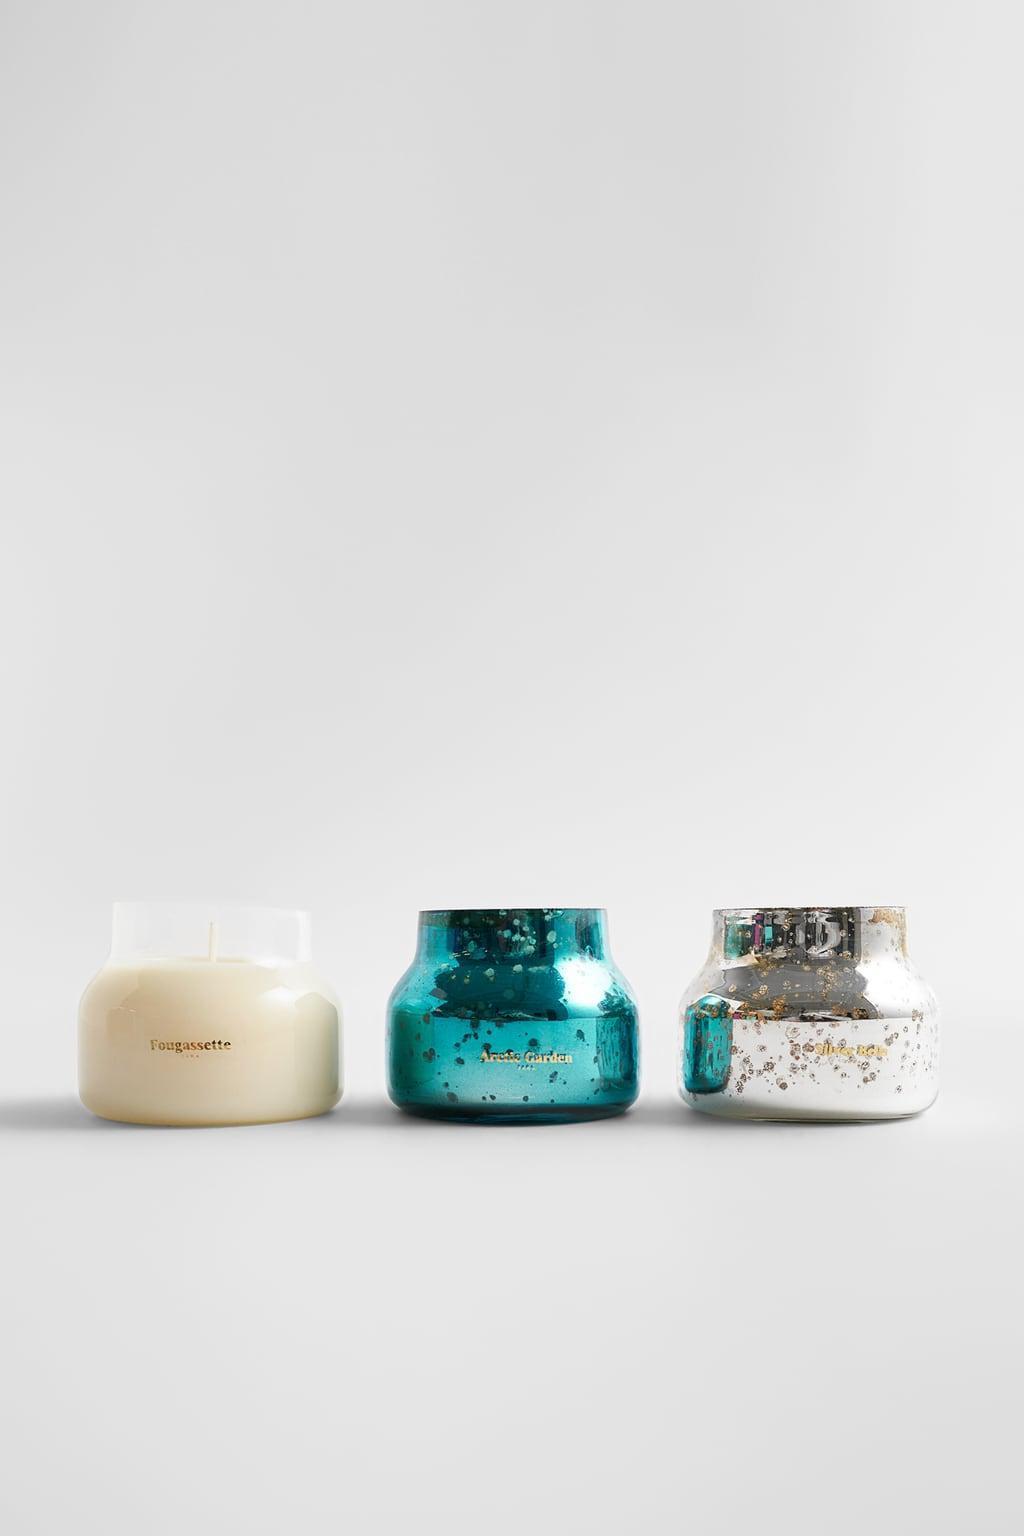 Отзыв на SILVER BELLS 100 G + ARCTIC GARDEN 100 G + FOUGASETTE 100 G из Интернет-Магазина Zara